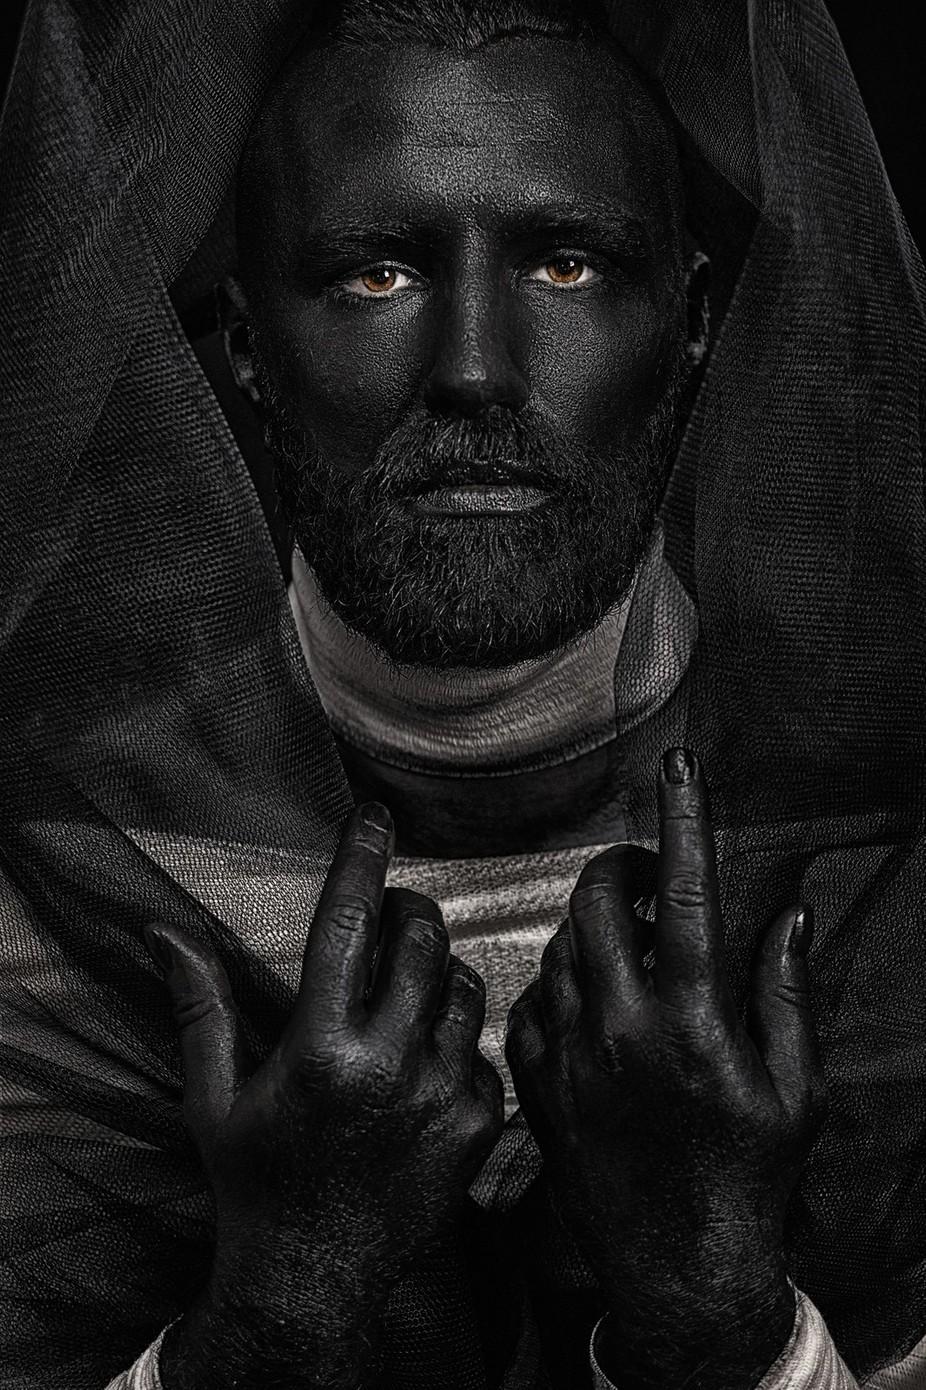 A0d_MdlrHYs by BerezinY - Male Portraits Photo Contest